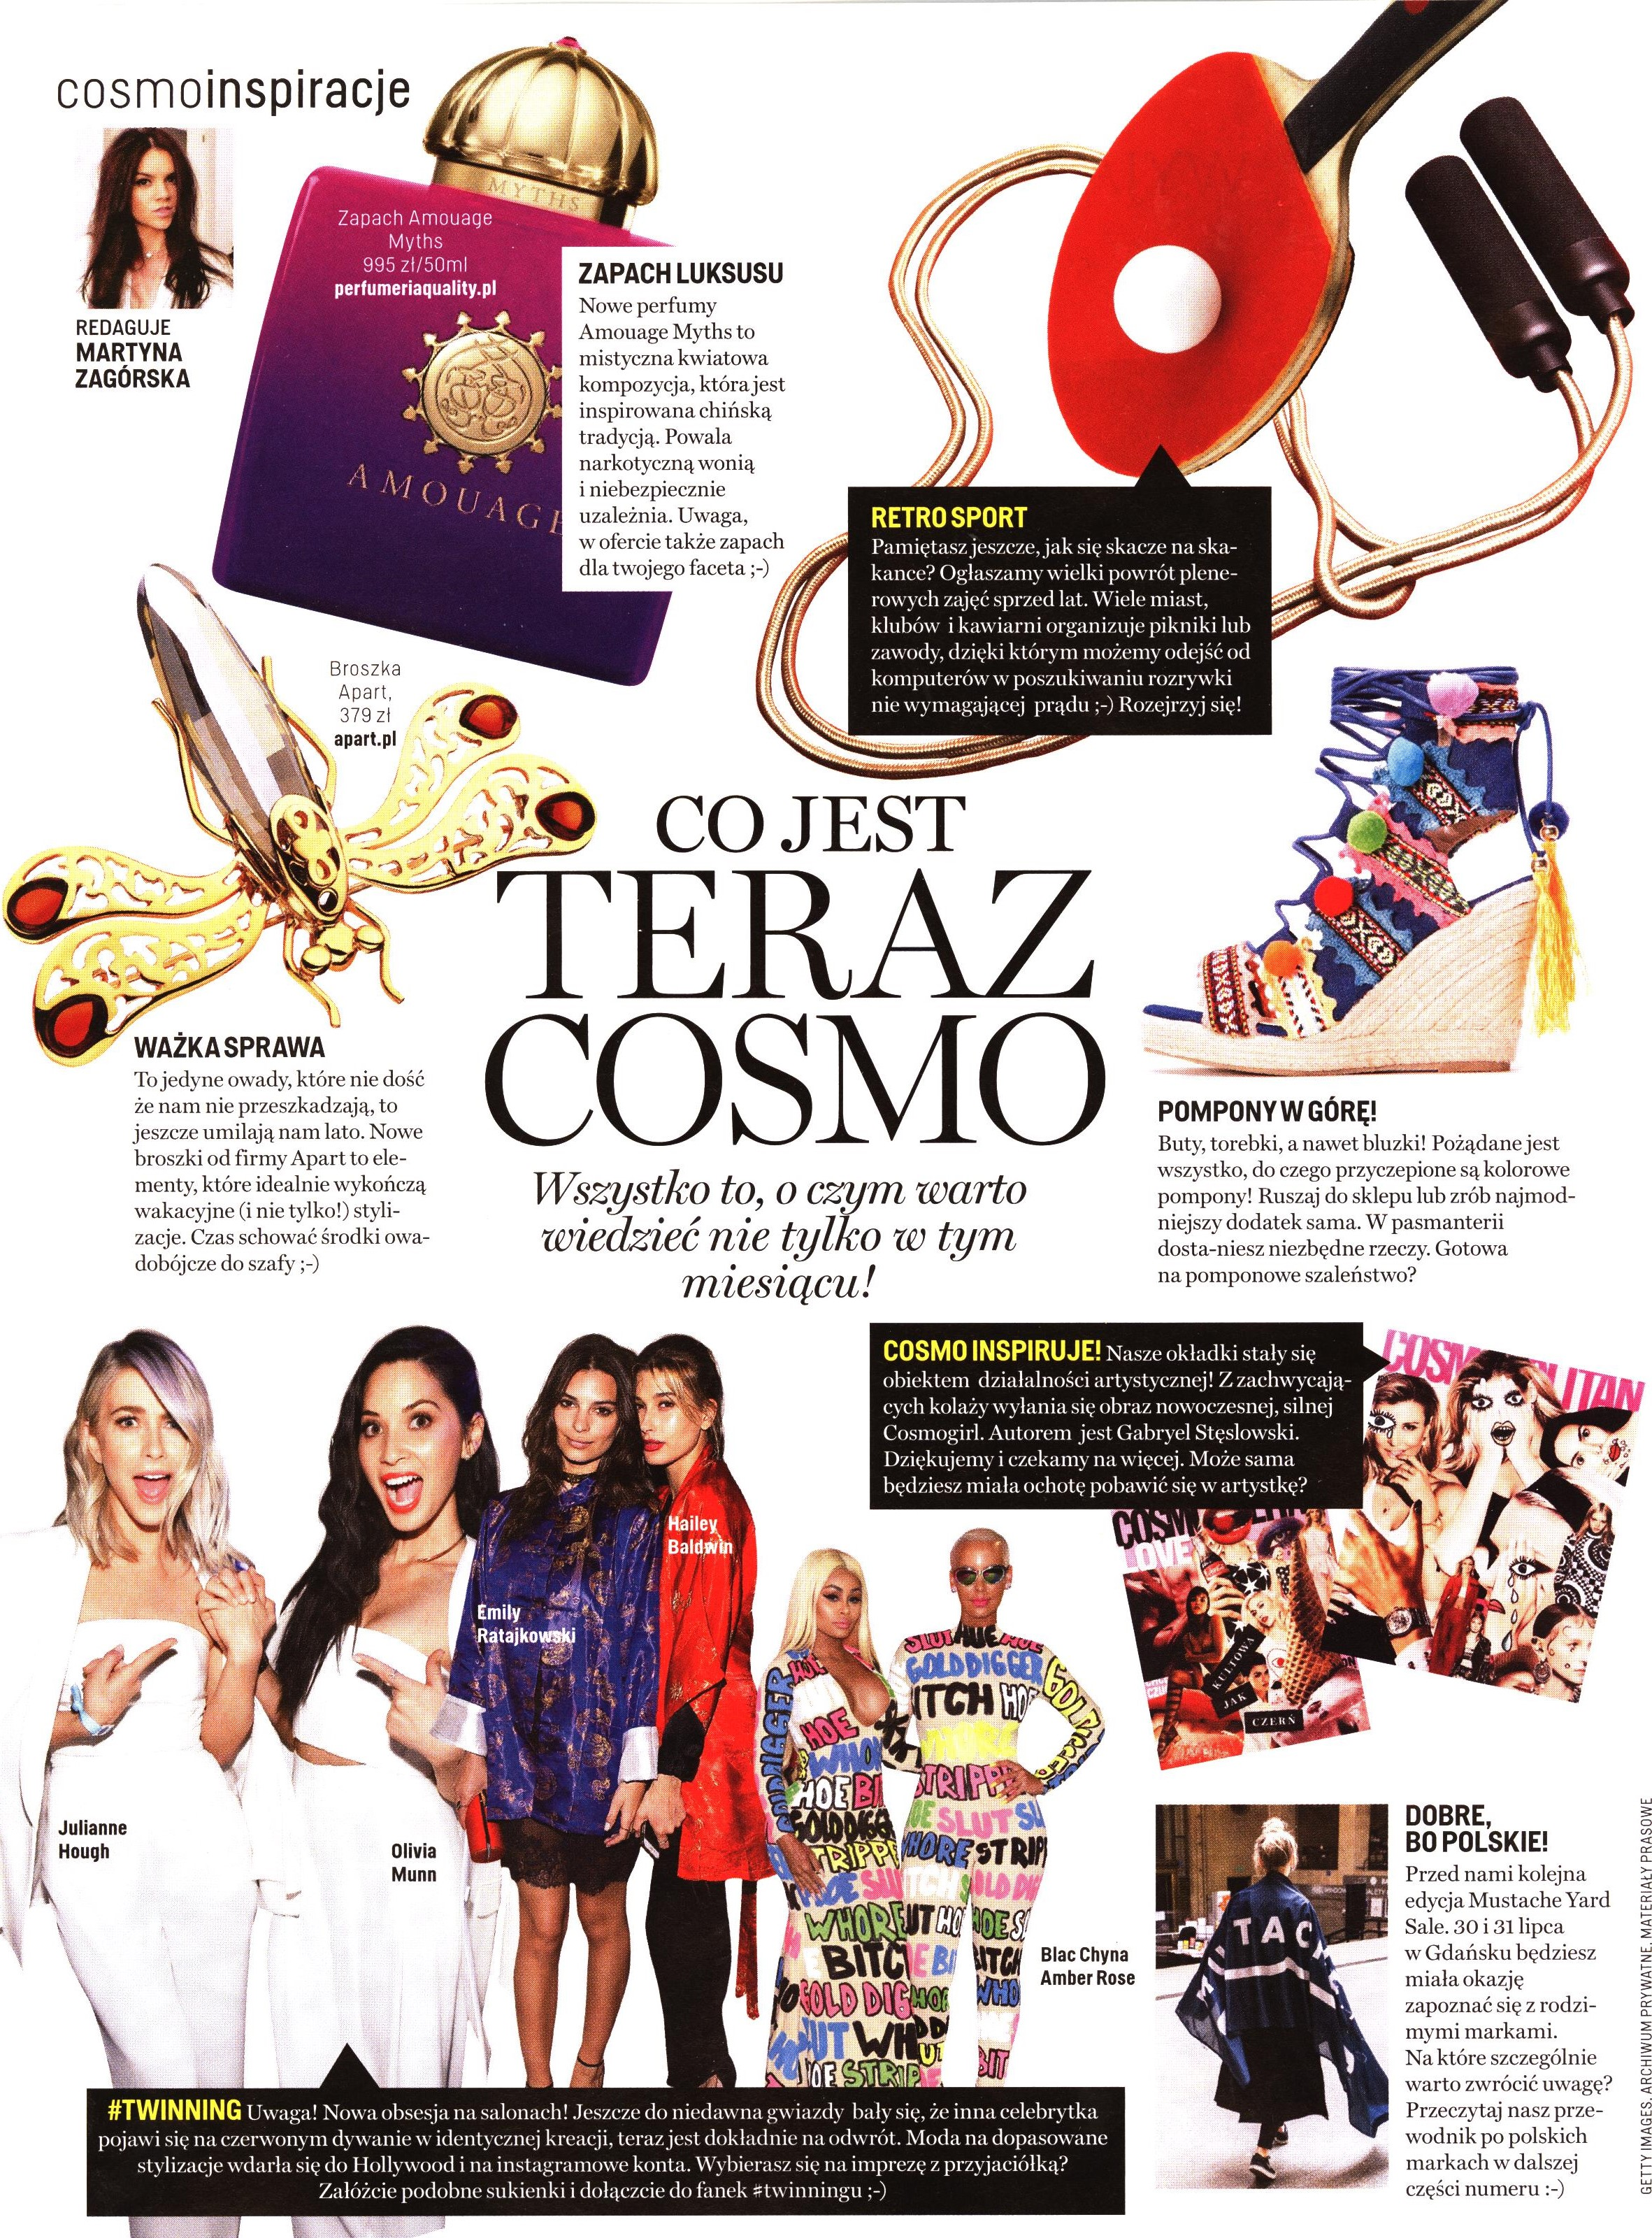 2016.08 Cosmopolitan_AMOUAGE Myths Woman